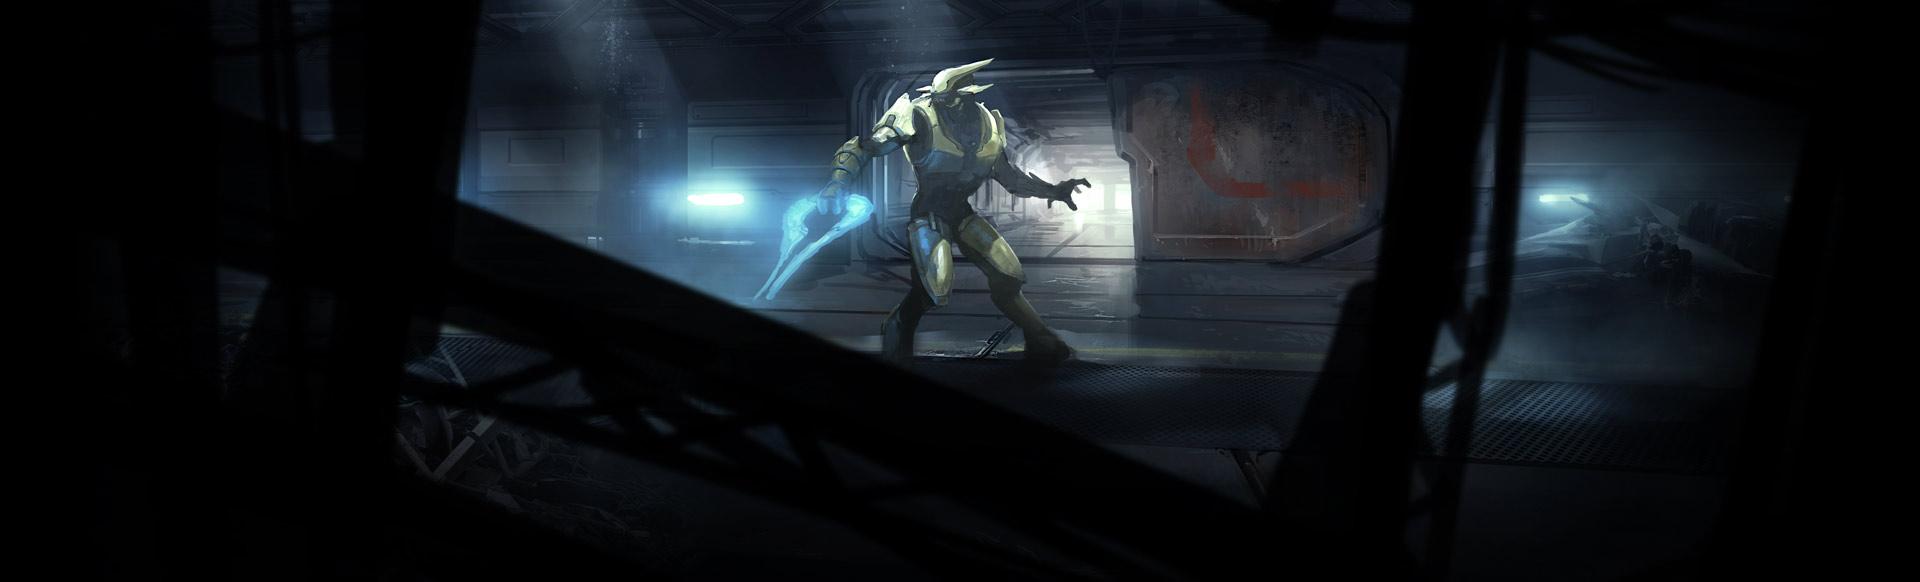 Halo the master chief collection comparison essay